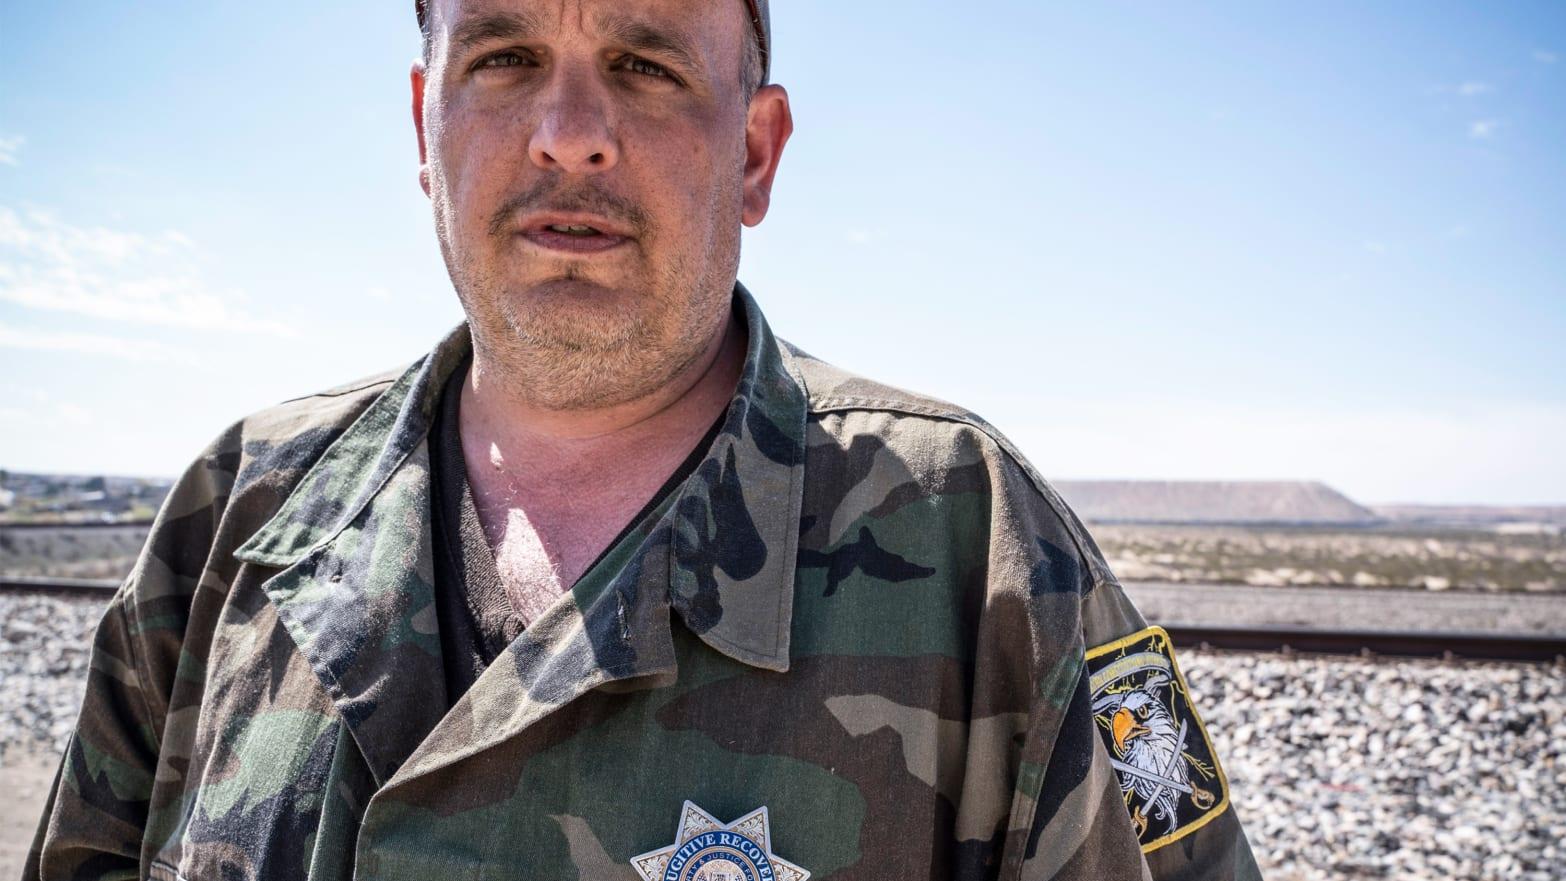 Border Vigilante Jim Benvie Was Accused of Running Child-Cancer Charity Scam